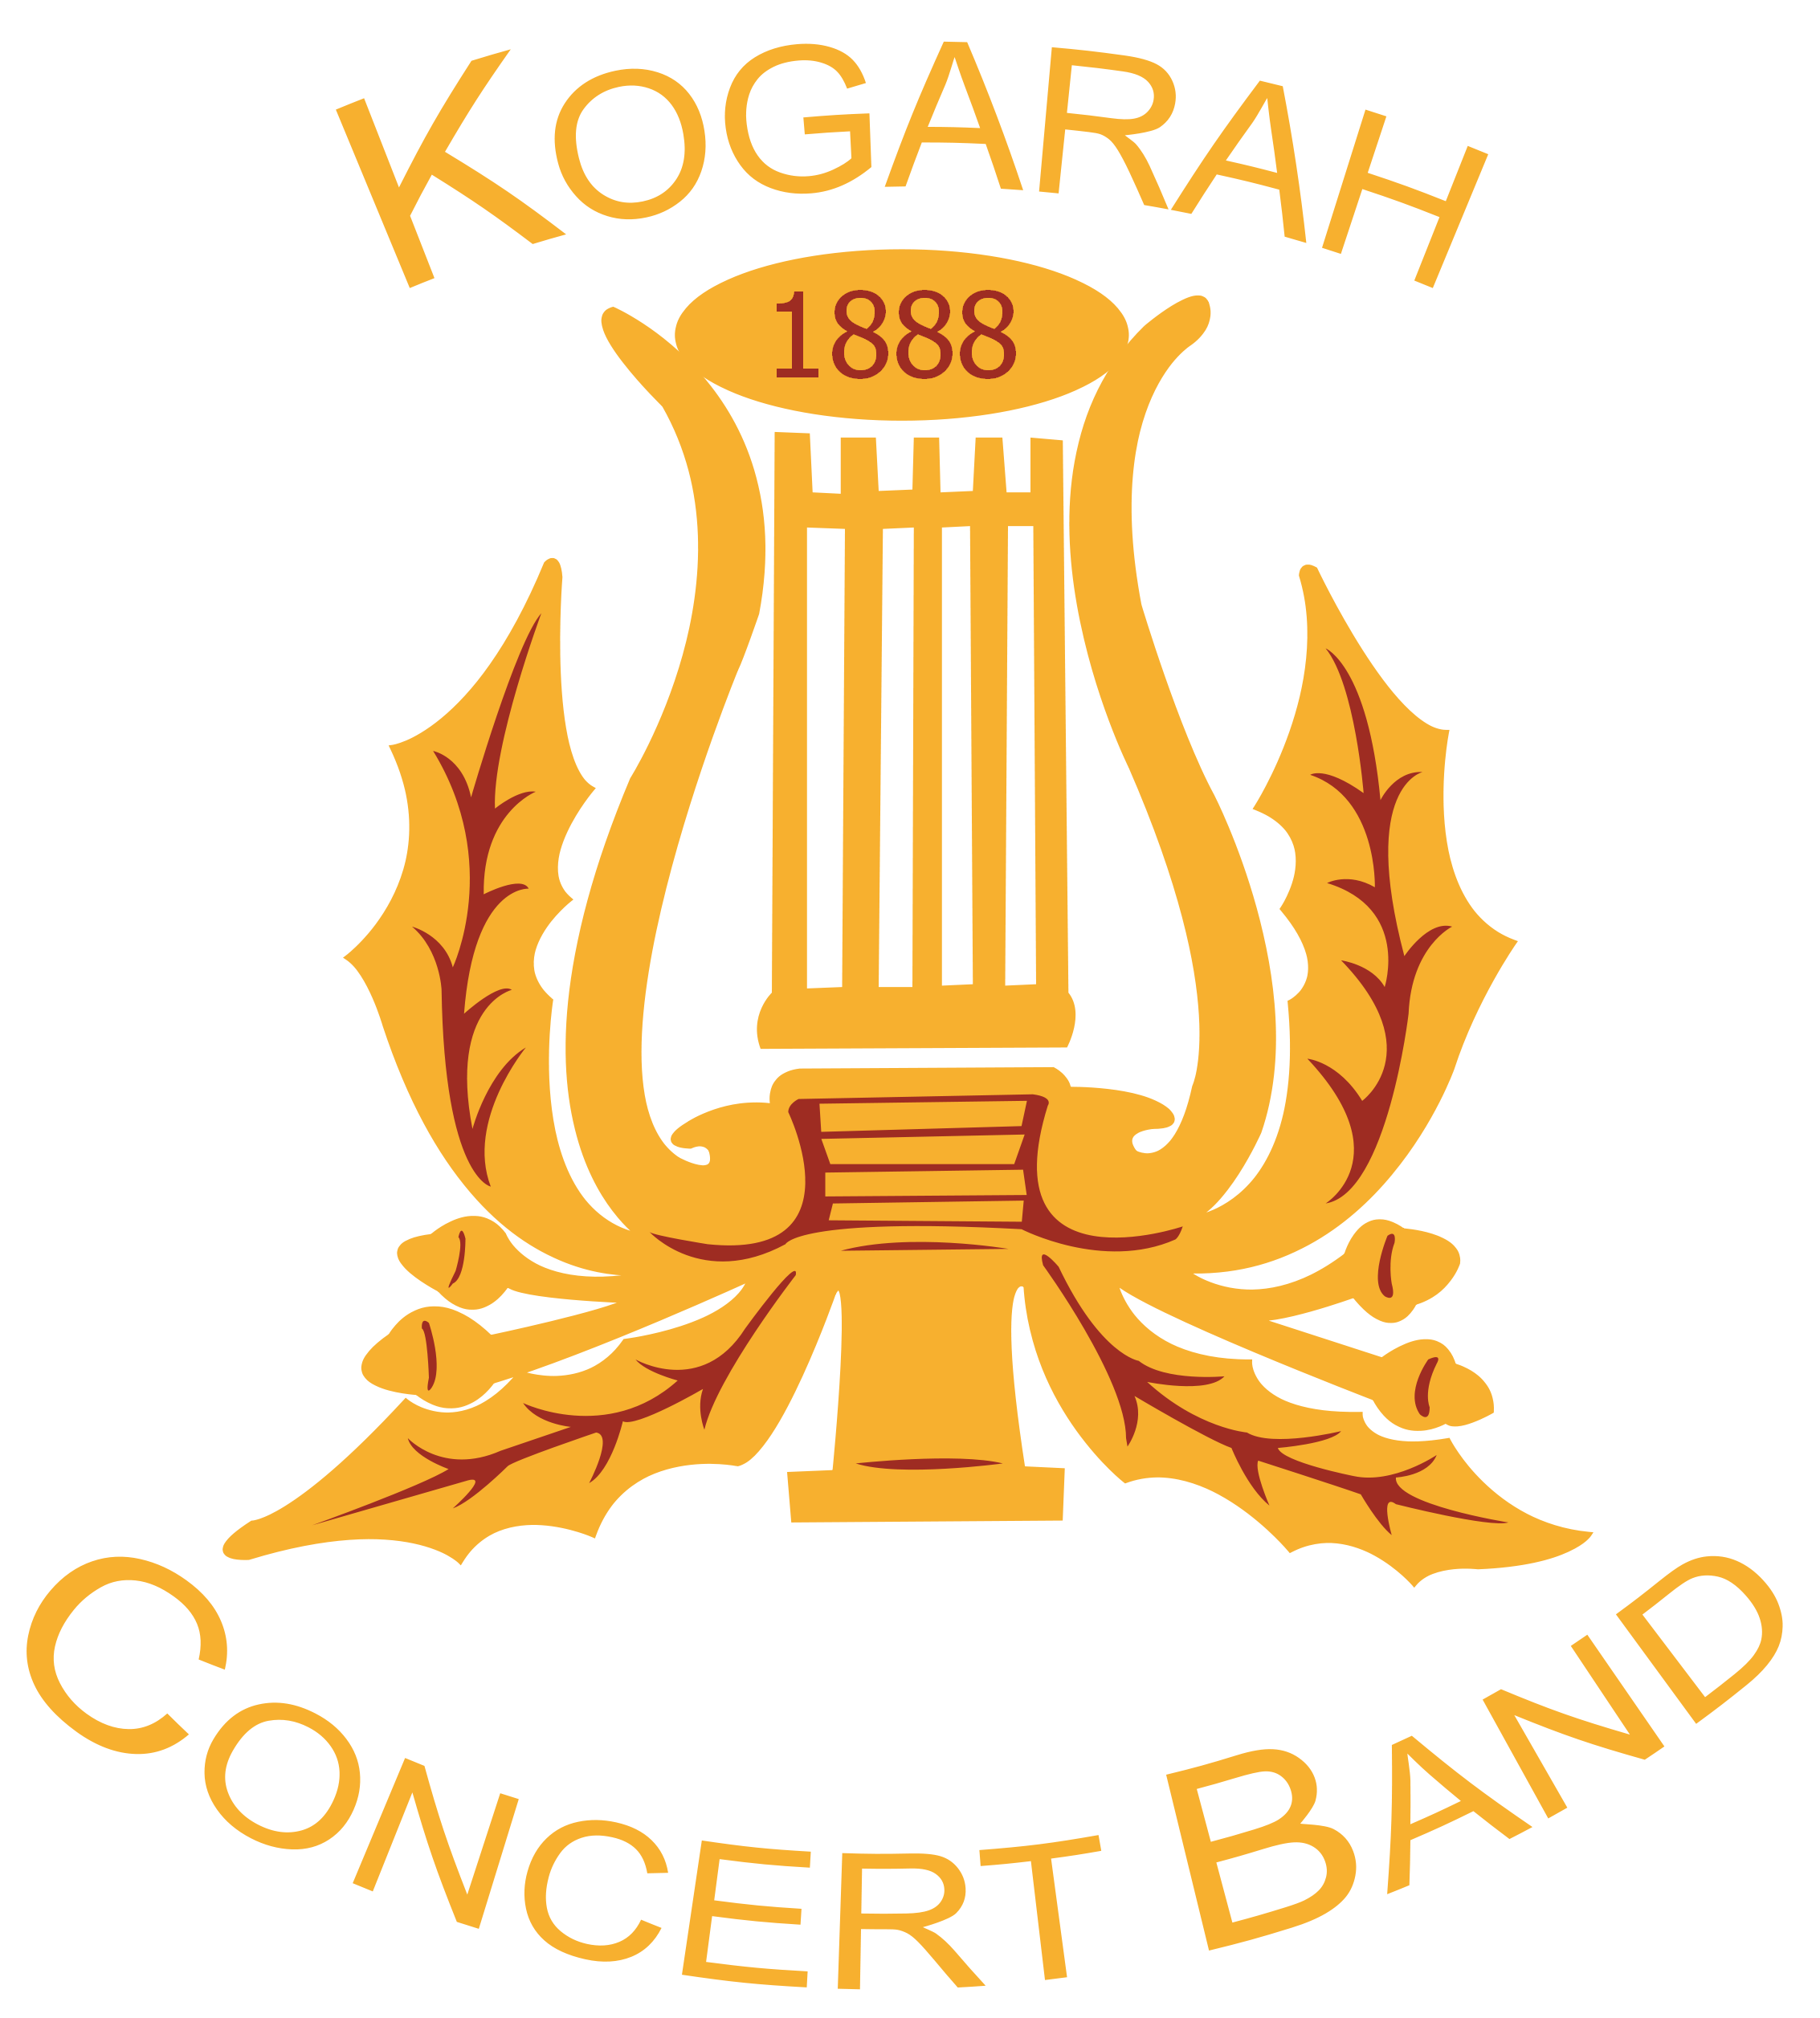 Kogarah Concert Band